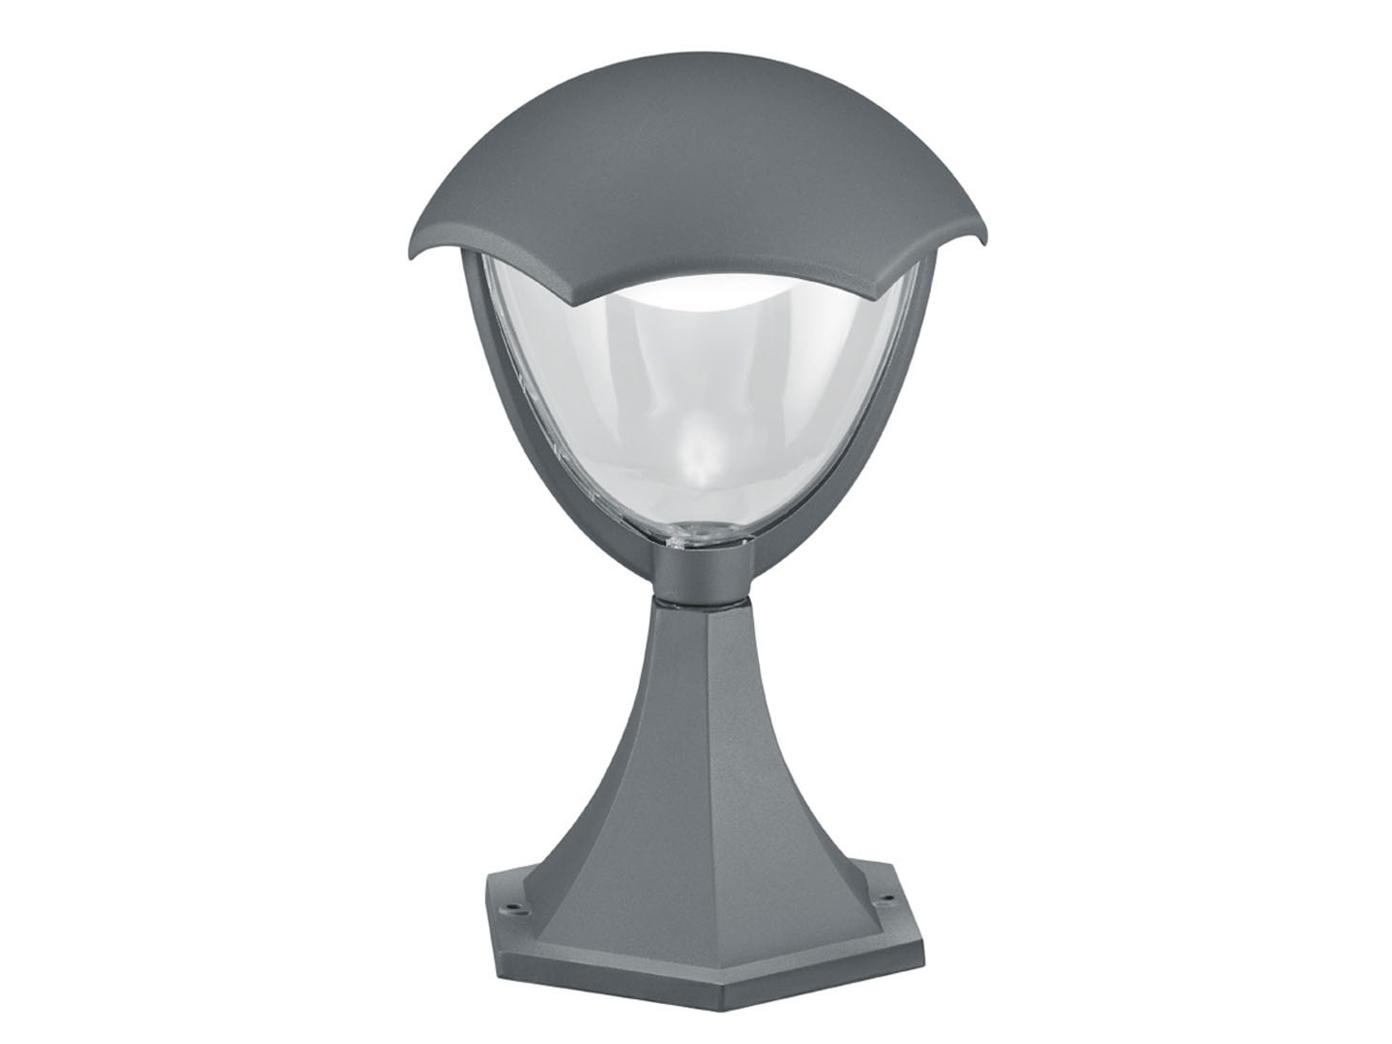 Trio LED LED LED Wegeleuchte Sockelleuchte GRACHT anthrazit, Außenlampe Gartenlaterne 3ad719